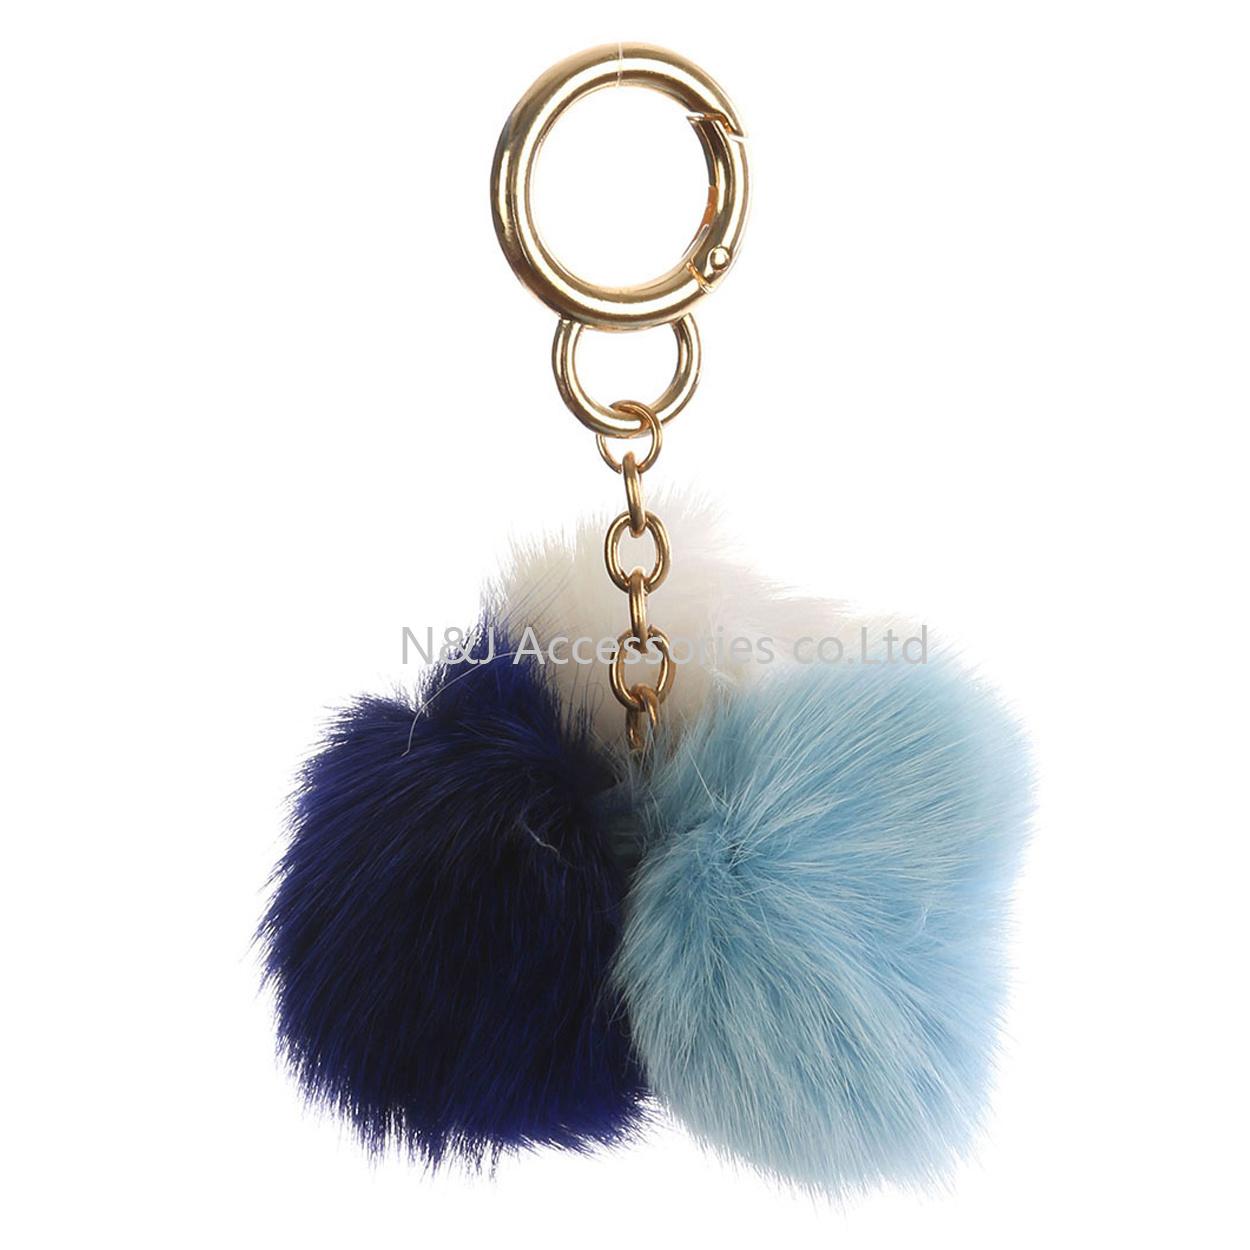 Faux Fur Pompom Bag Accessory Multi Color Key Chain